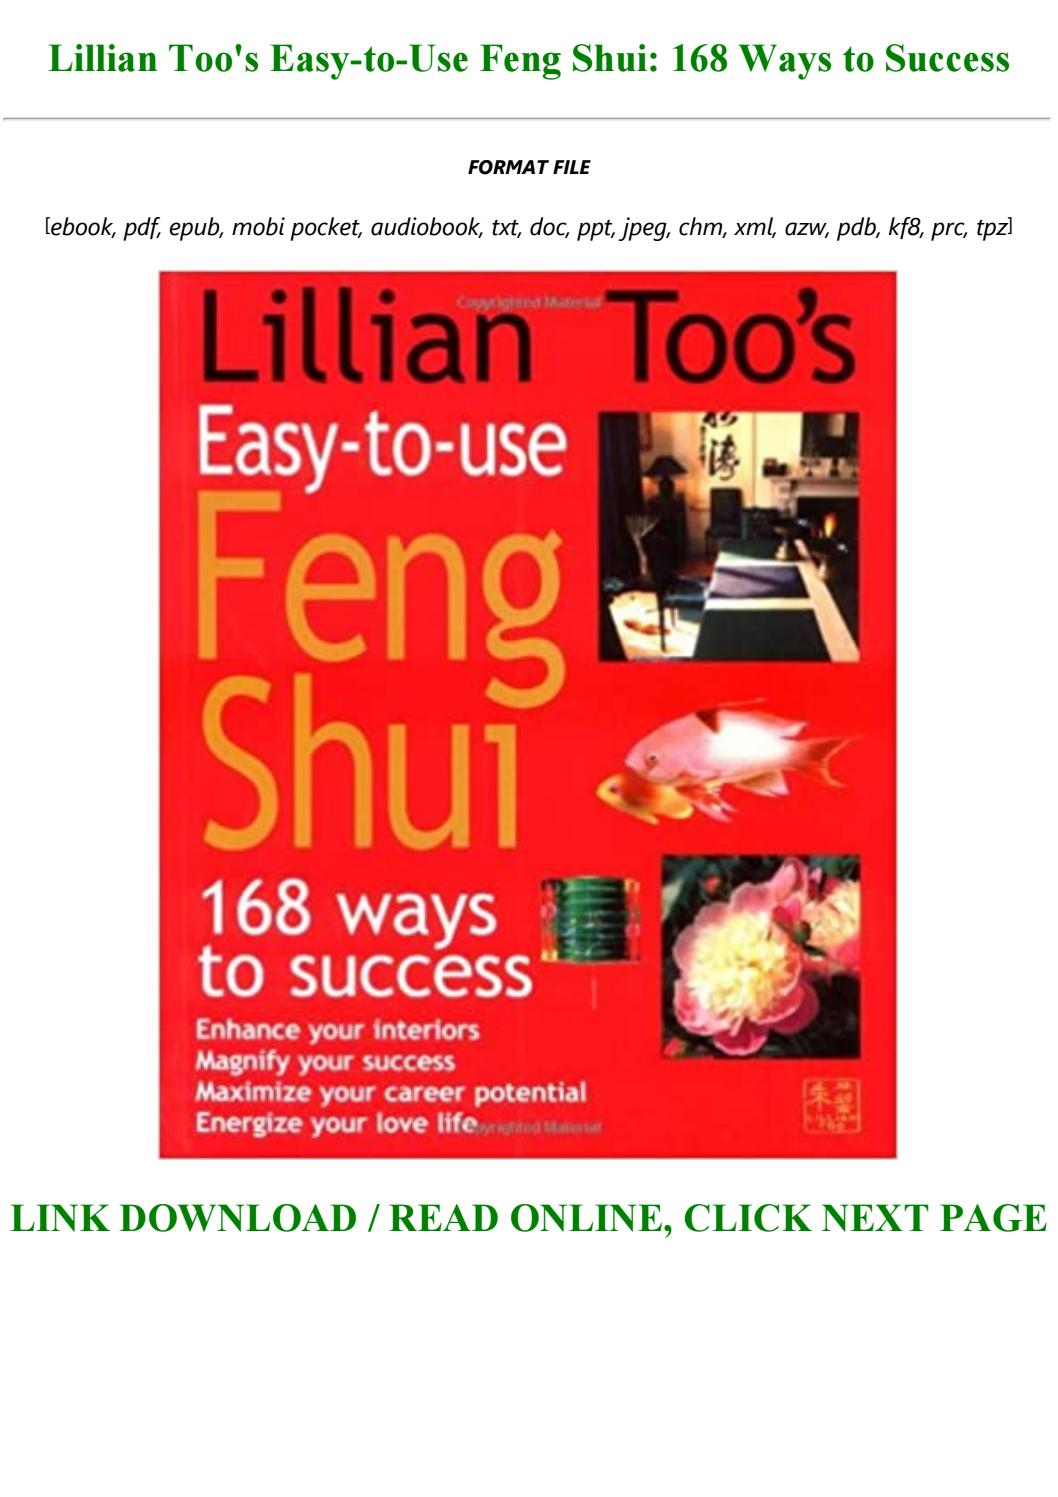 feng shui lillian too free download